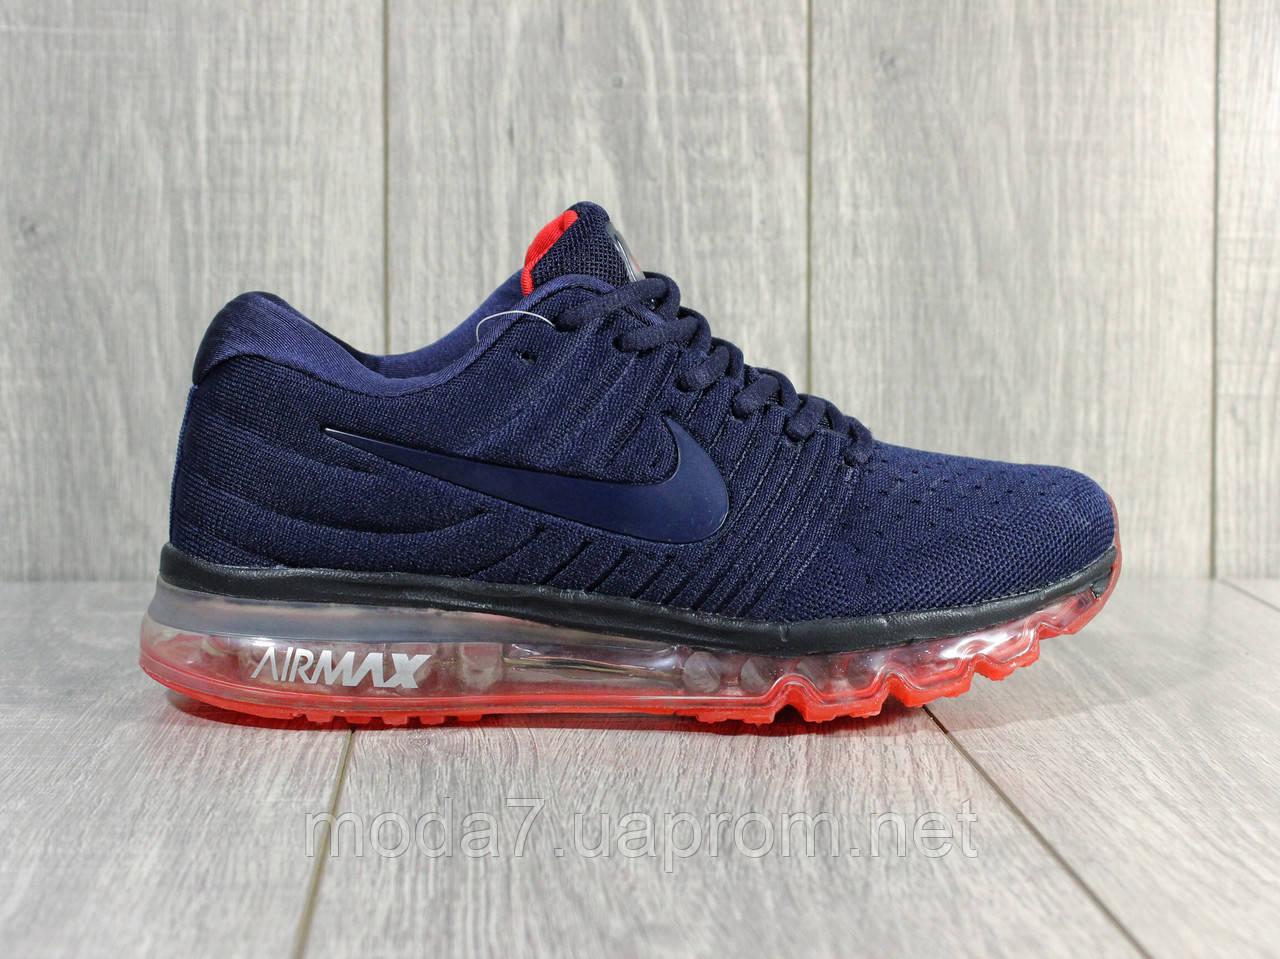 Кроссовки мужские синие Nike air max 2017 сетка реплика